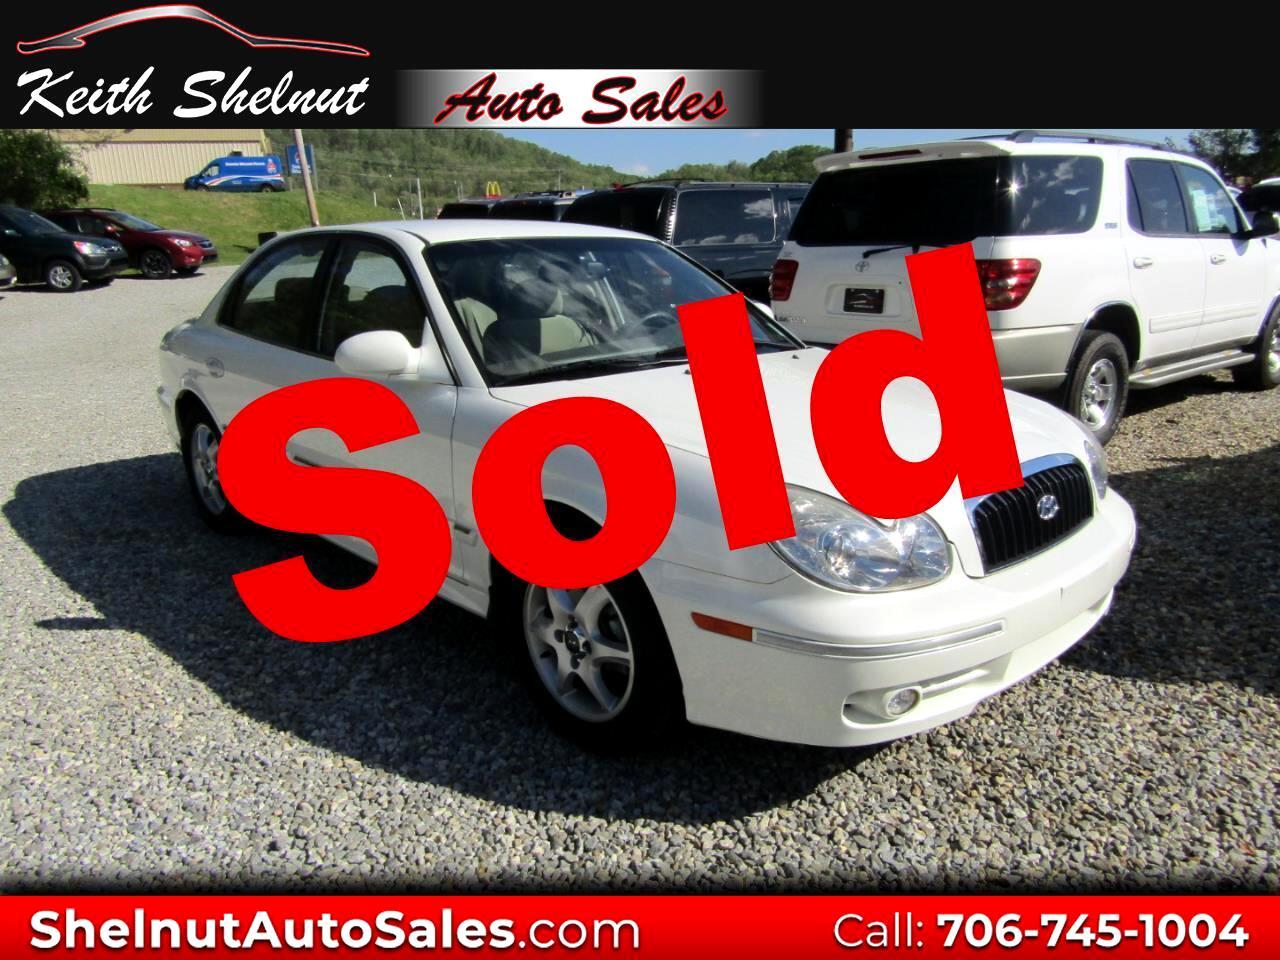 2005 Hyundai Sonata 4dr Sdn GLS Special Value V6 Auto